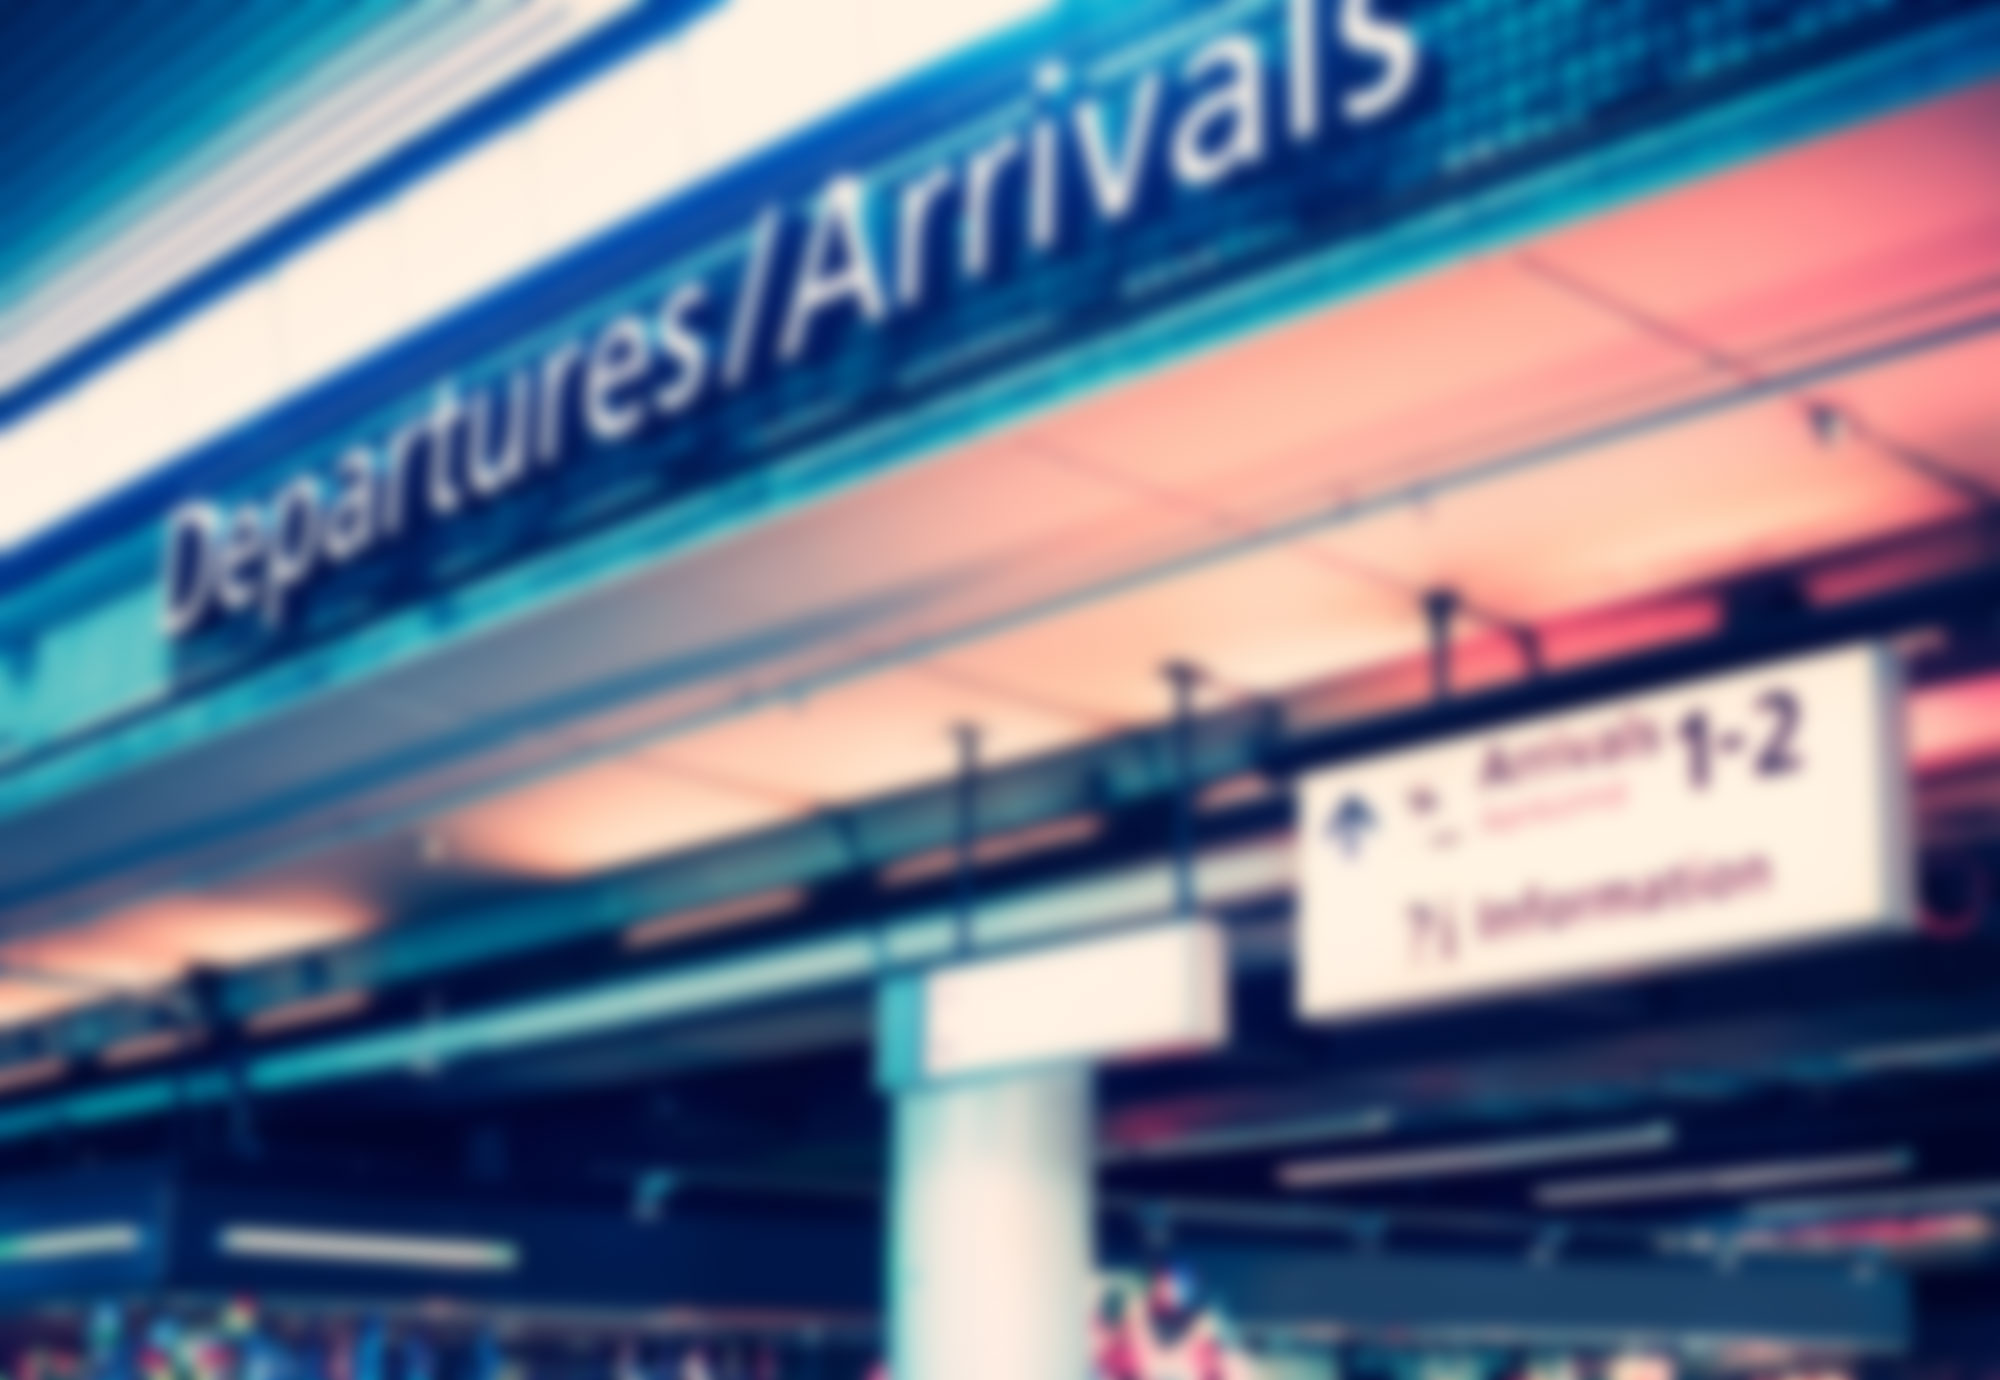 Airport Arrivals/Departures